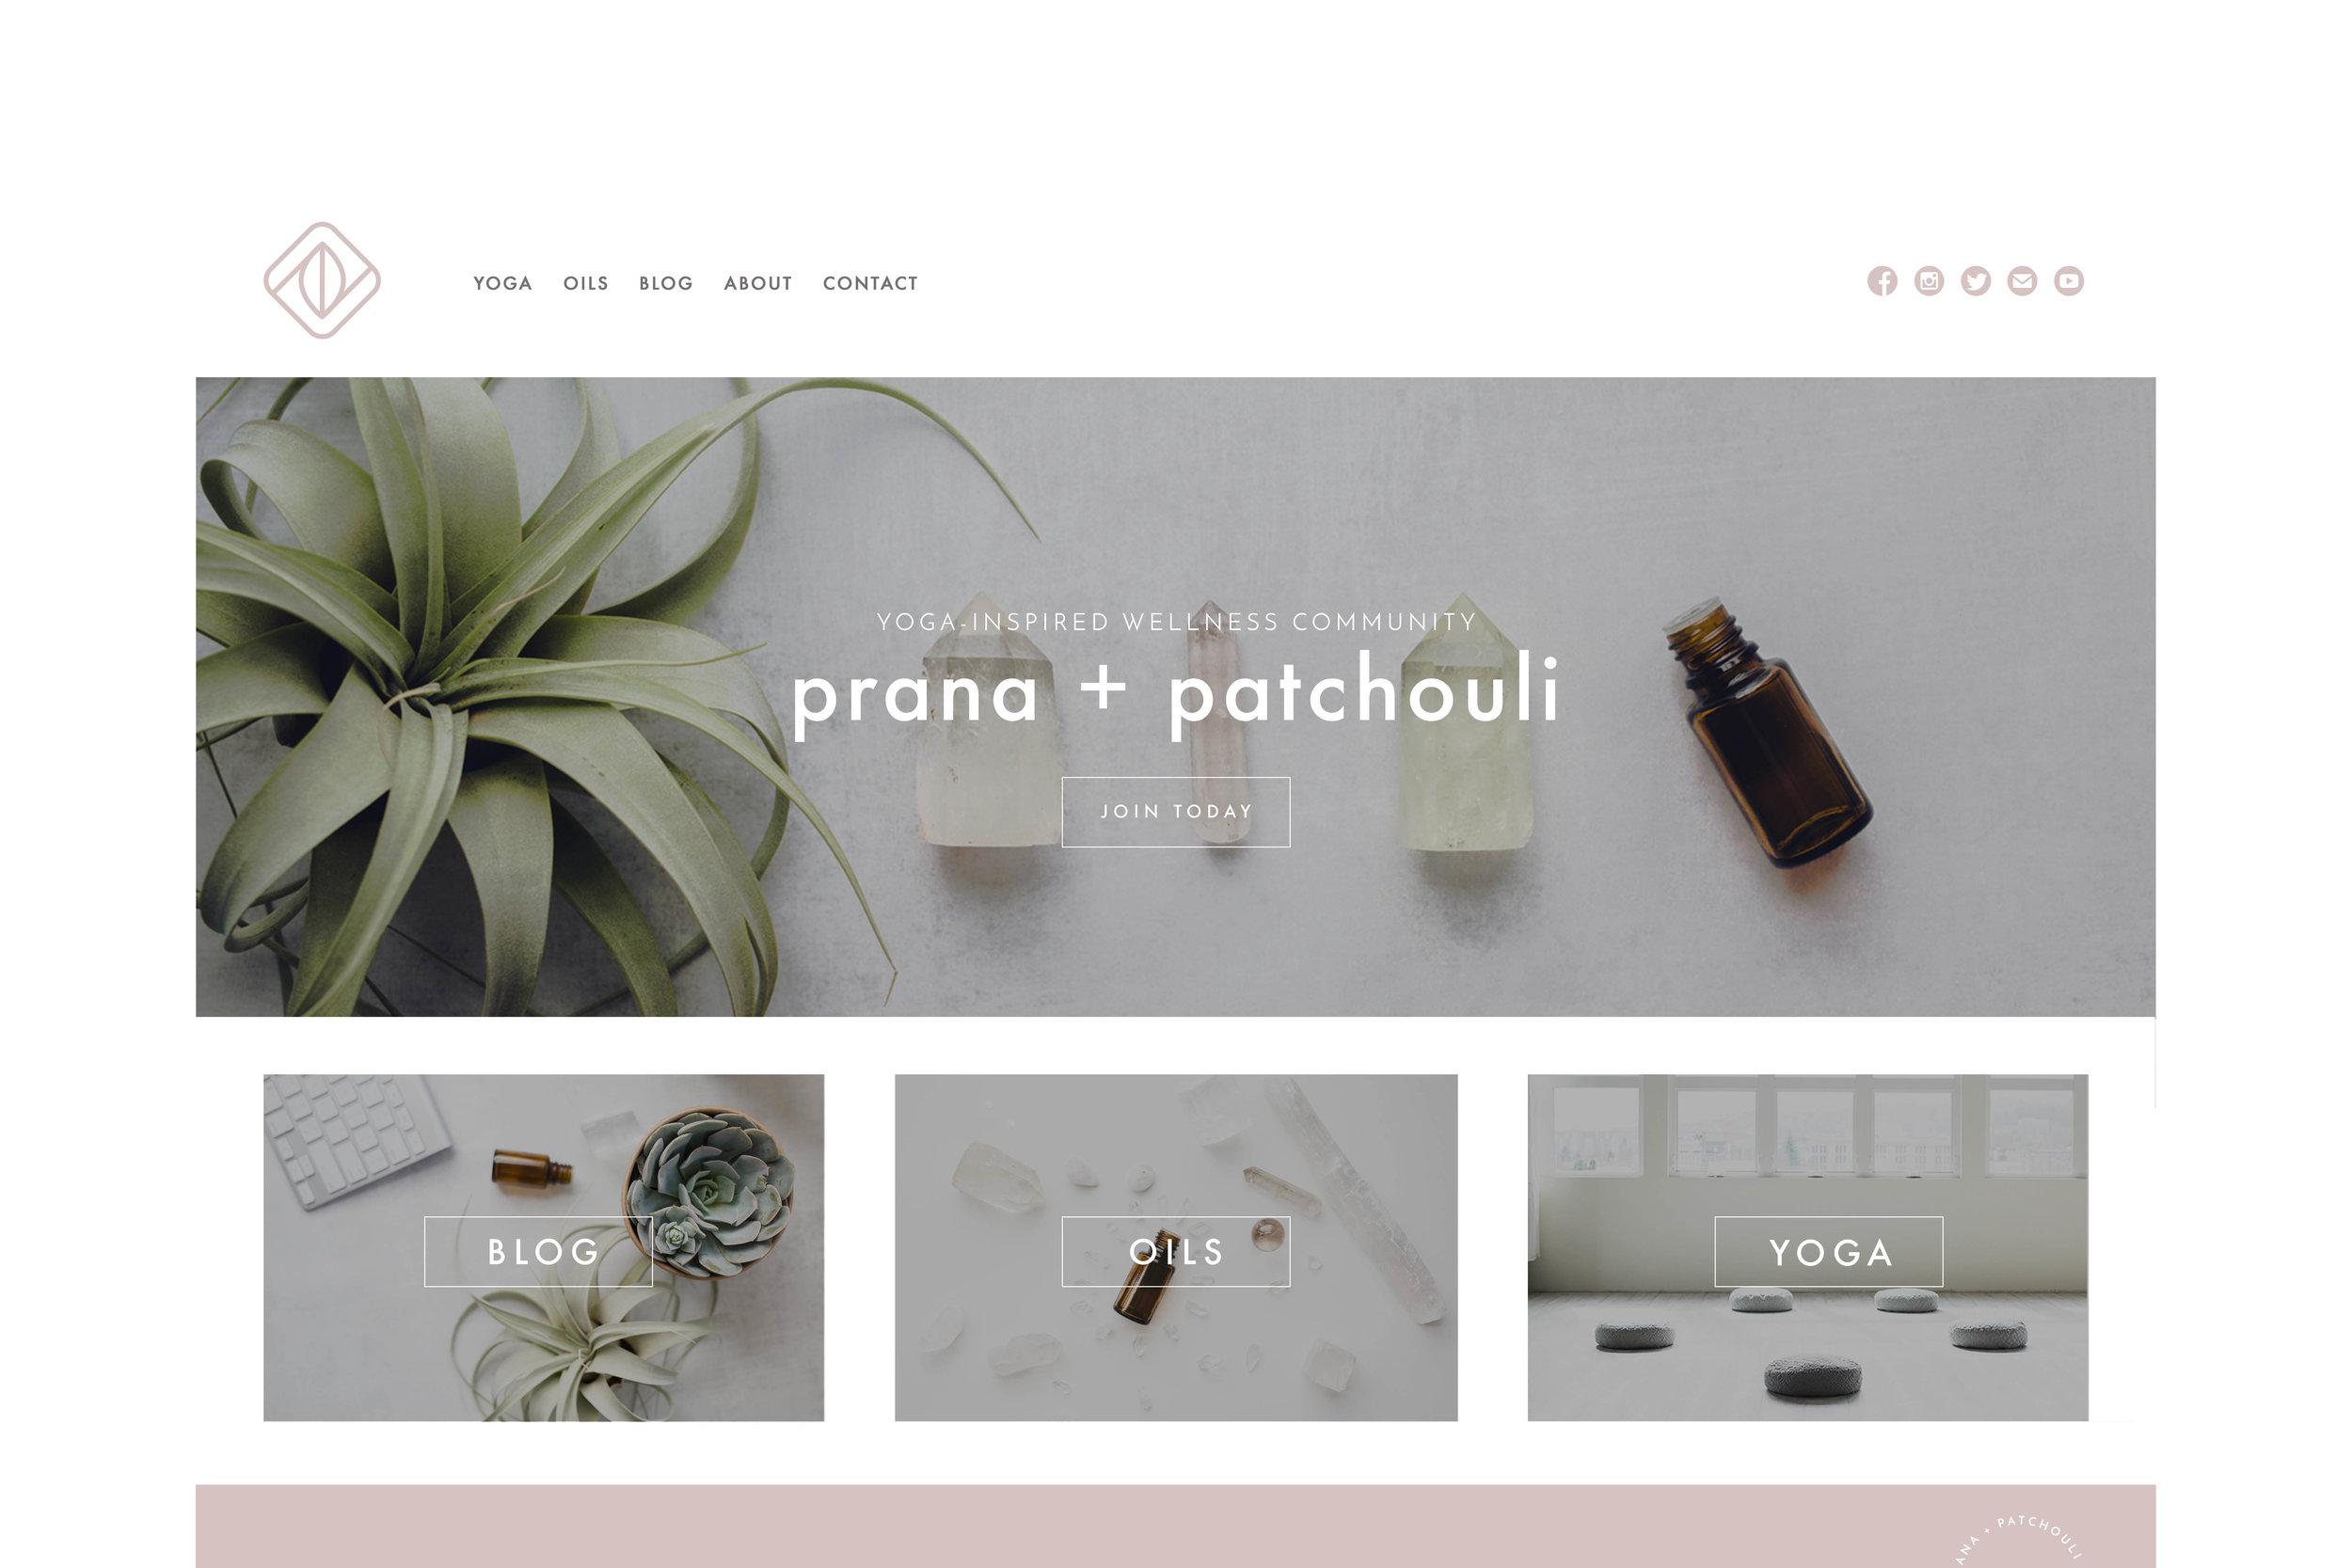 Prana & Patchouli Website Design